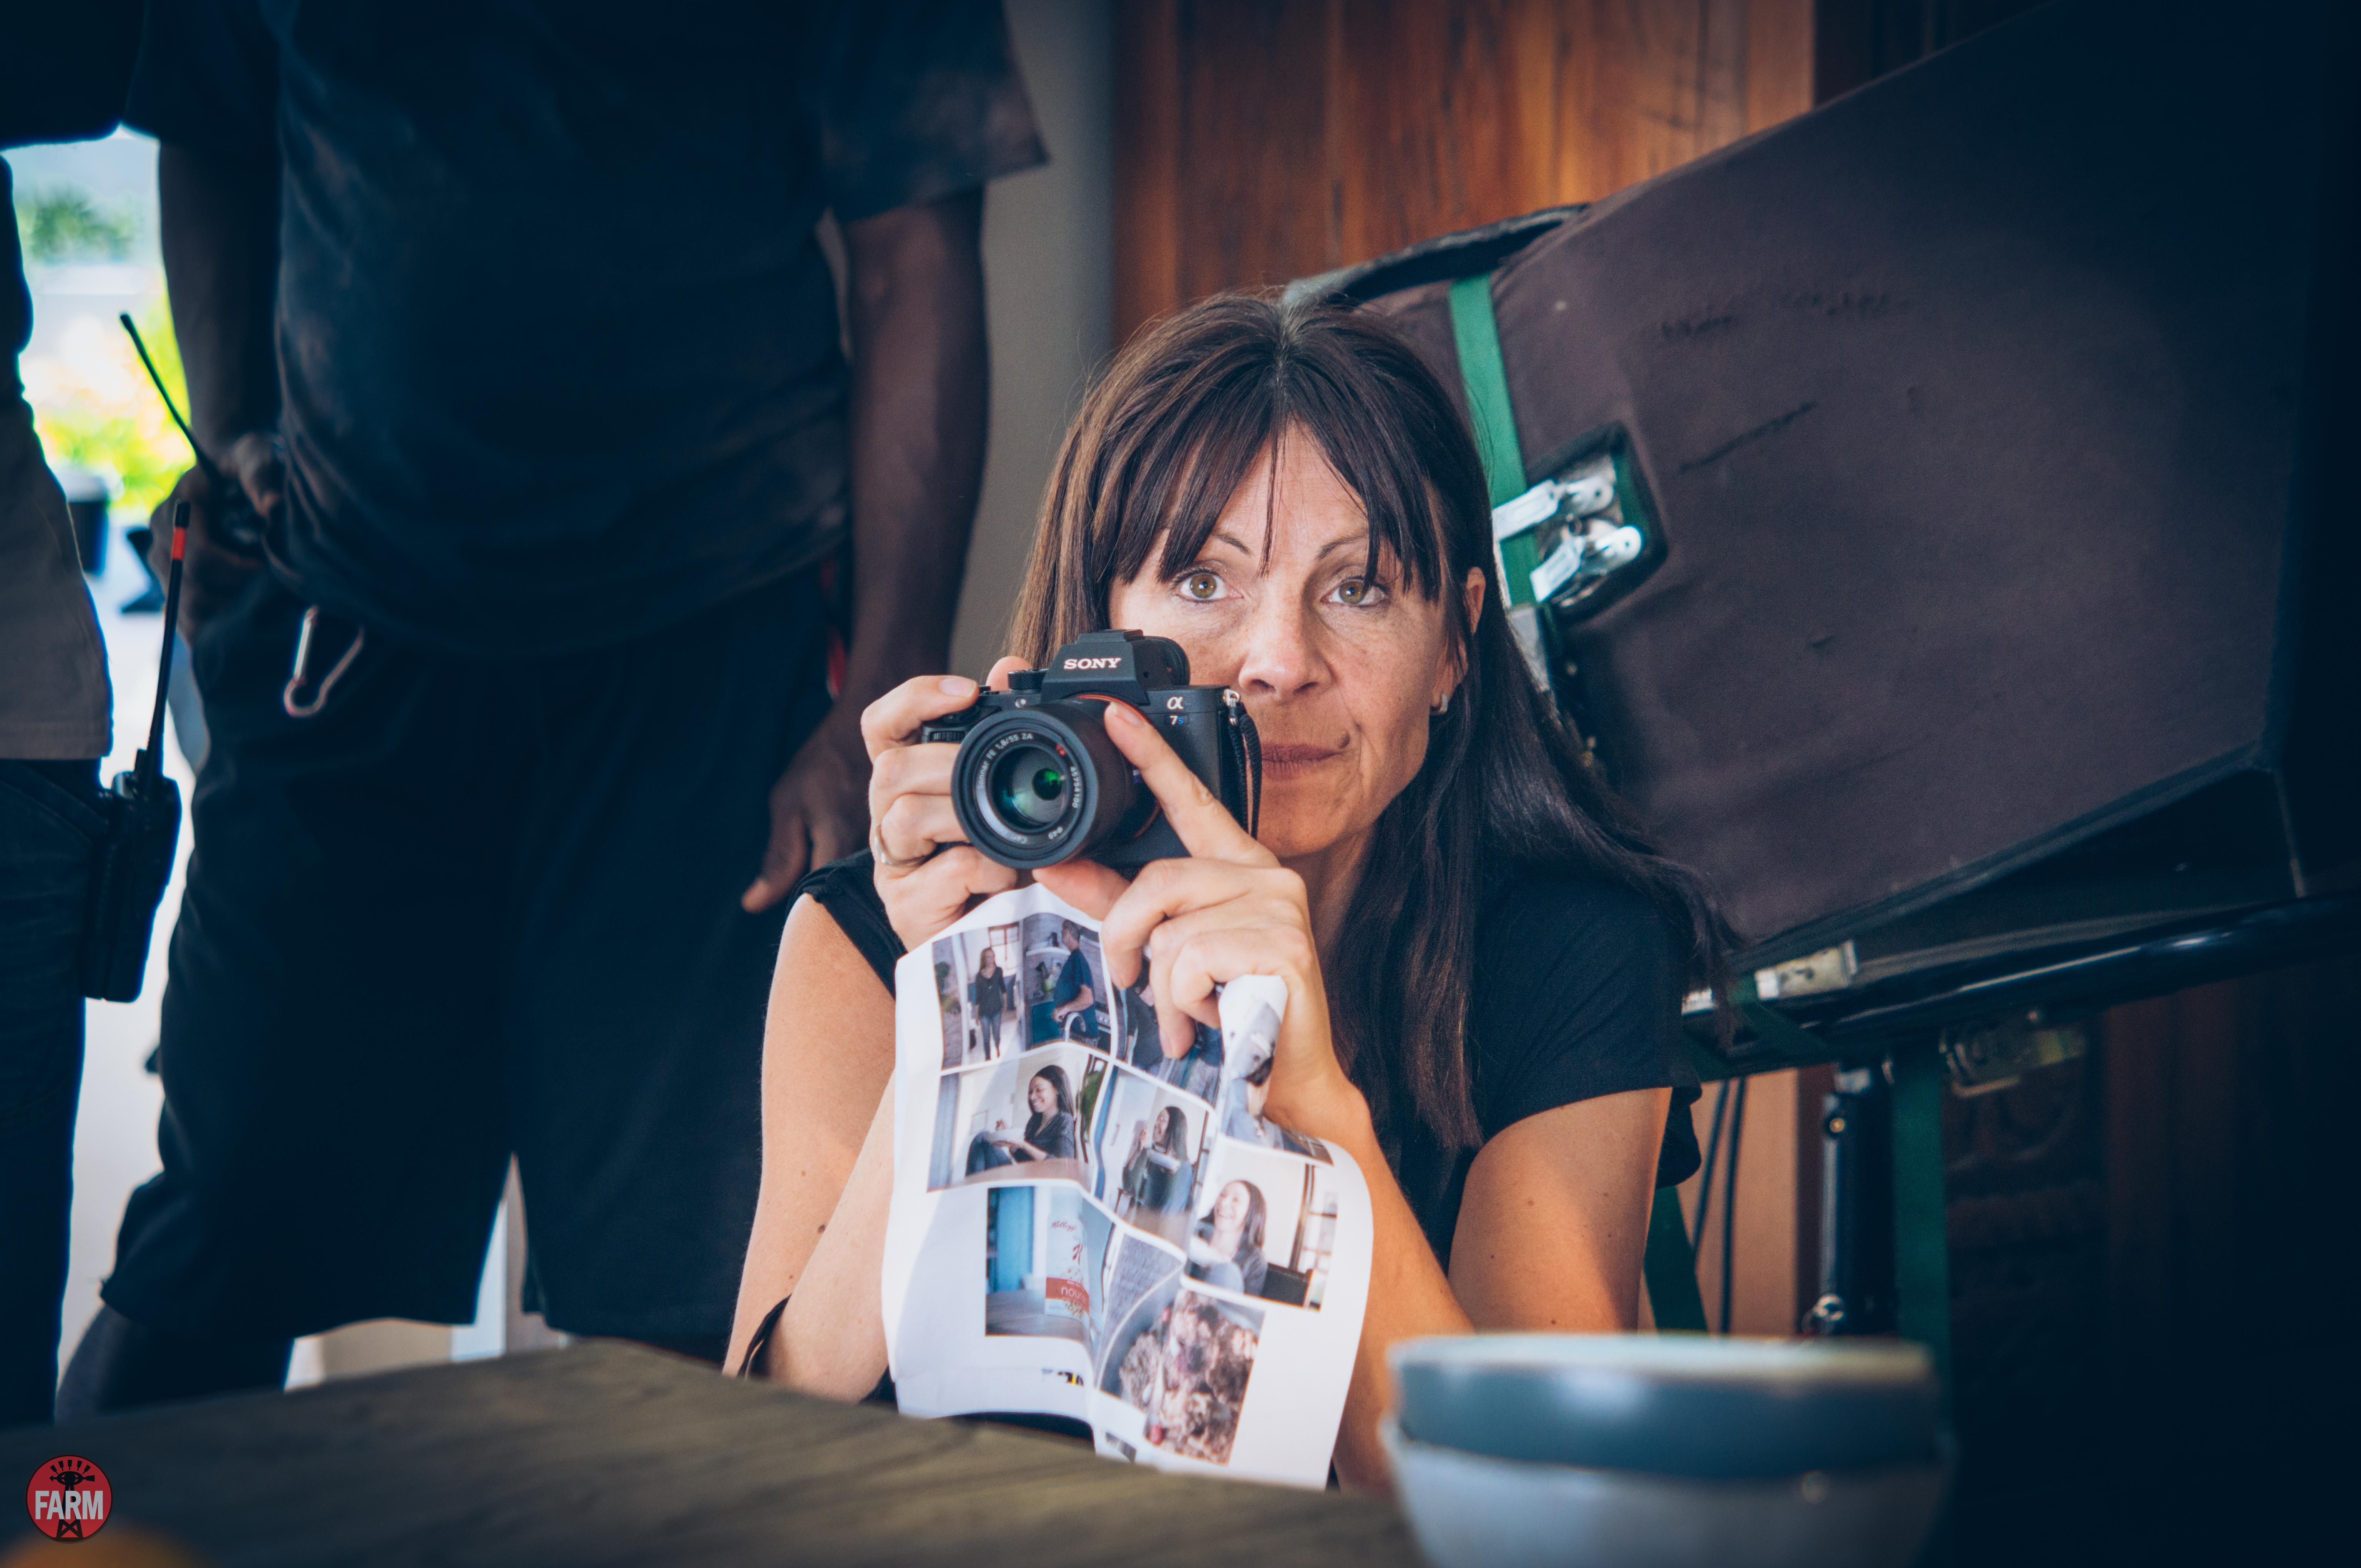 Director: Lucy Blakstad